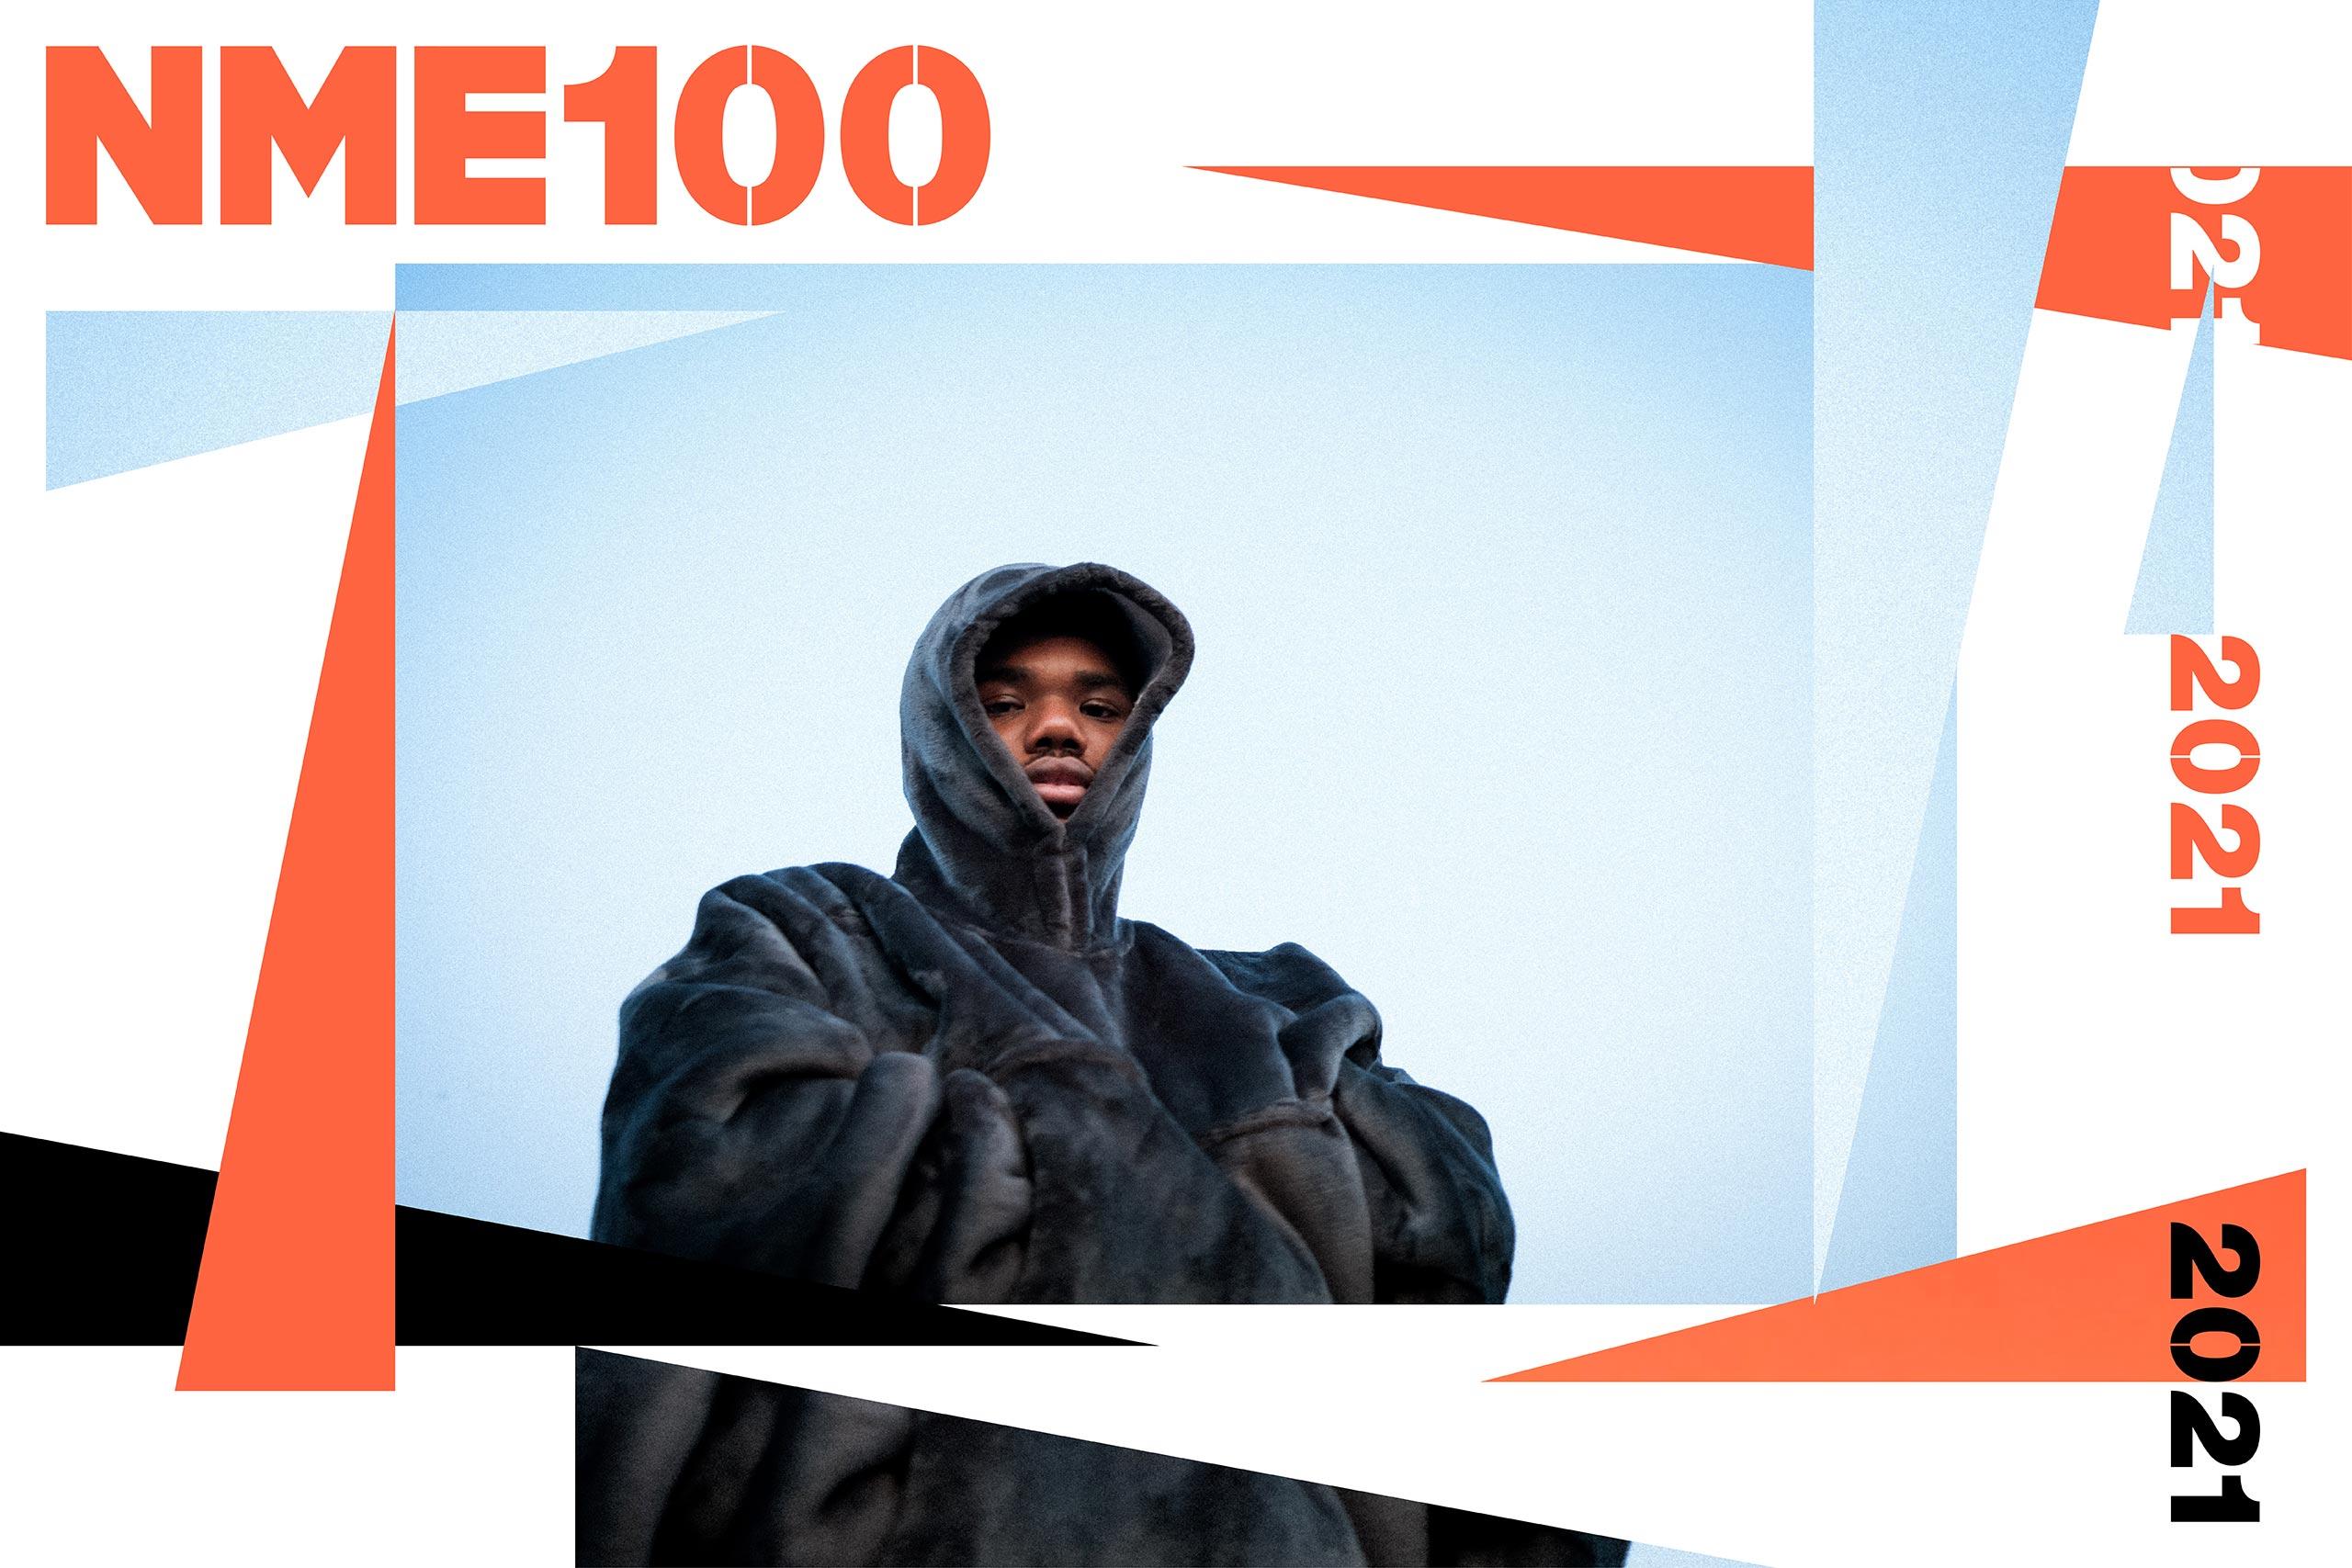 NME 100 baby keem